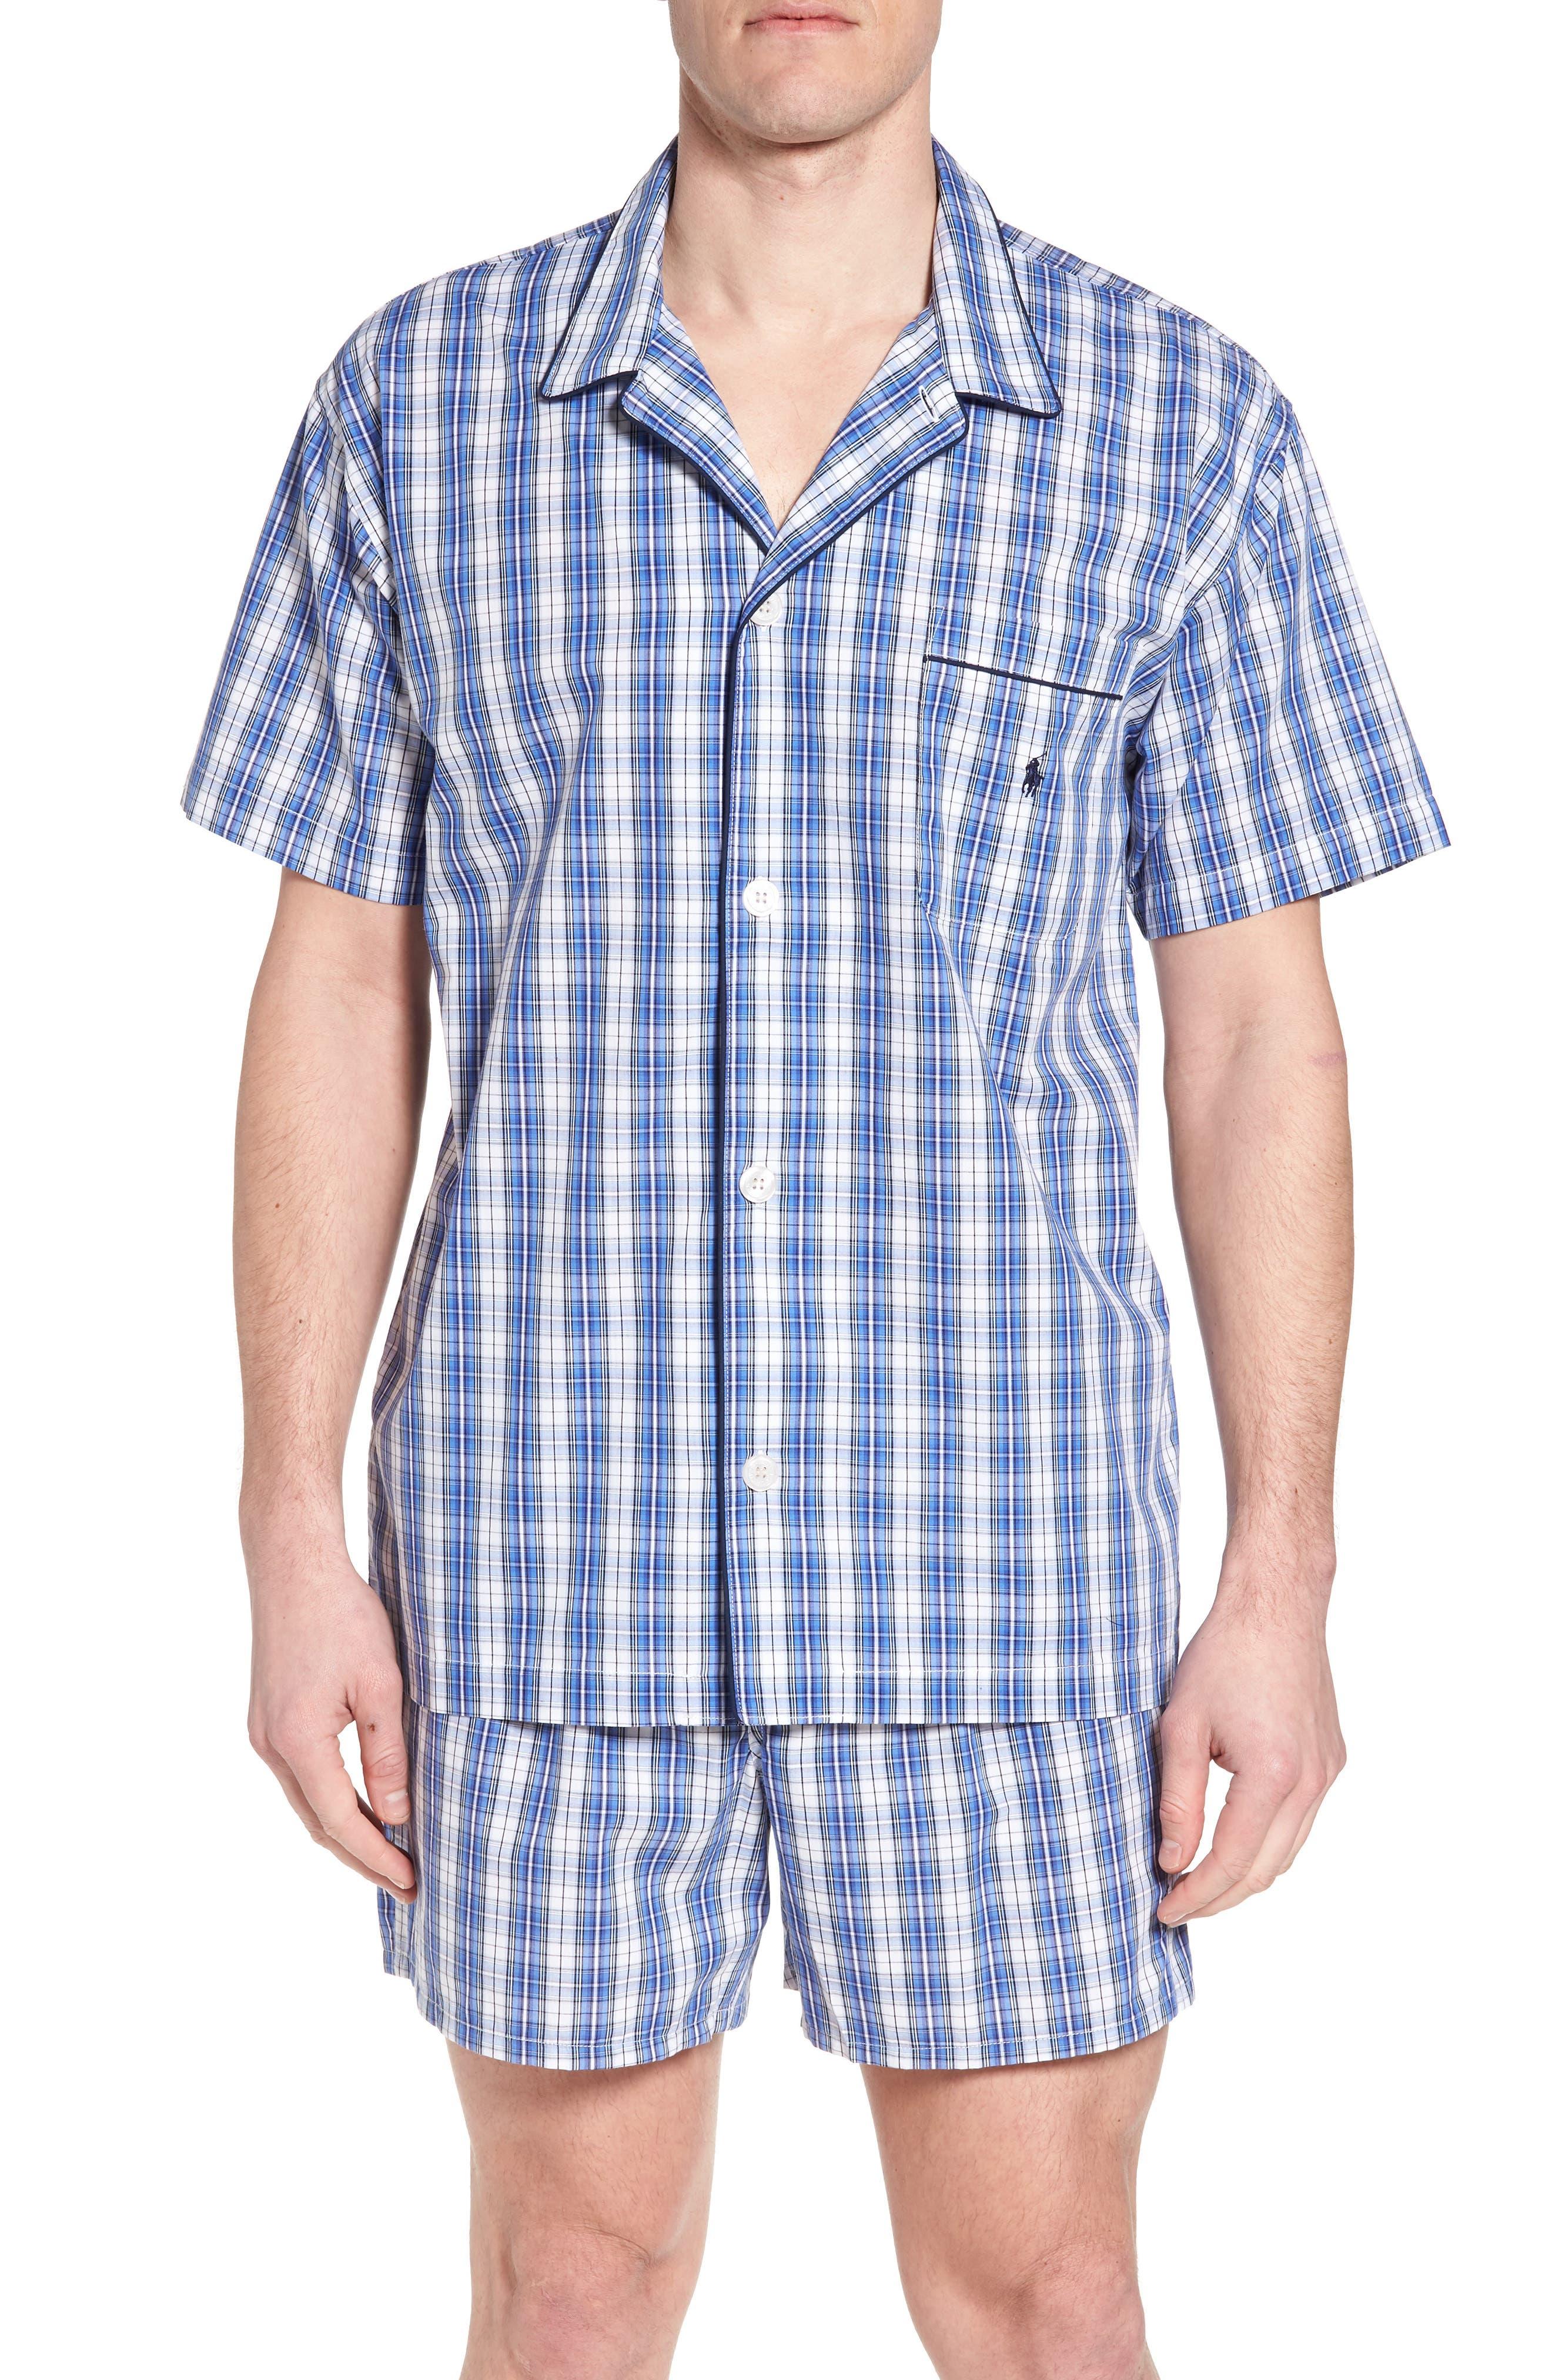 Polo Ralph Lauren Cotton Pajama Shirt